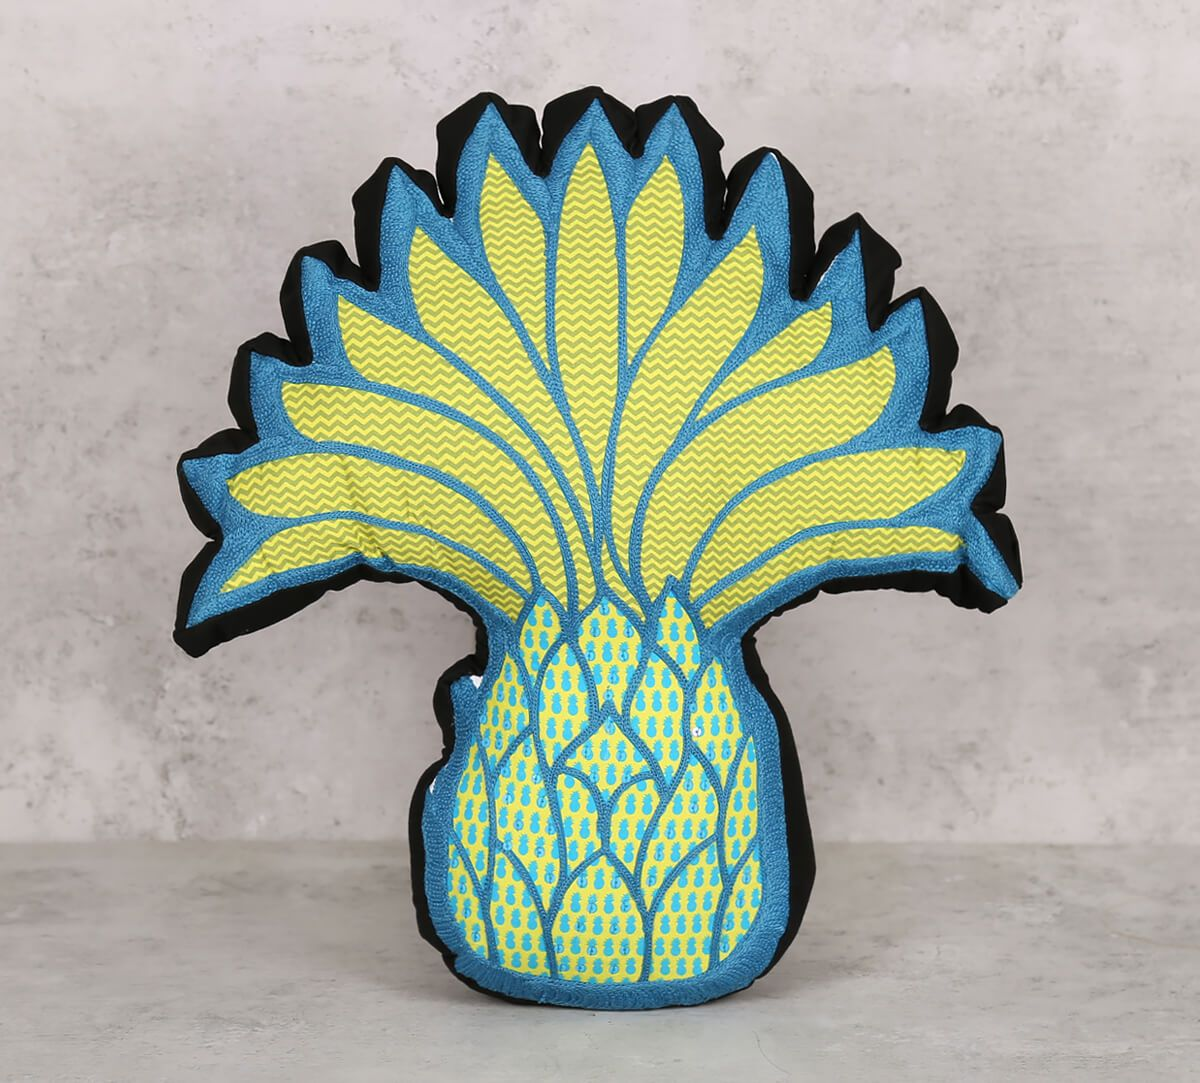 India Circus Pineapple Shaped Cushion